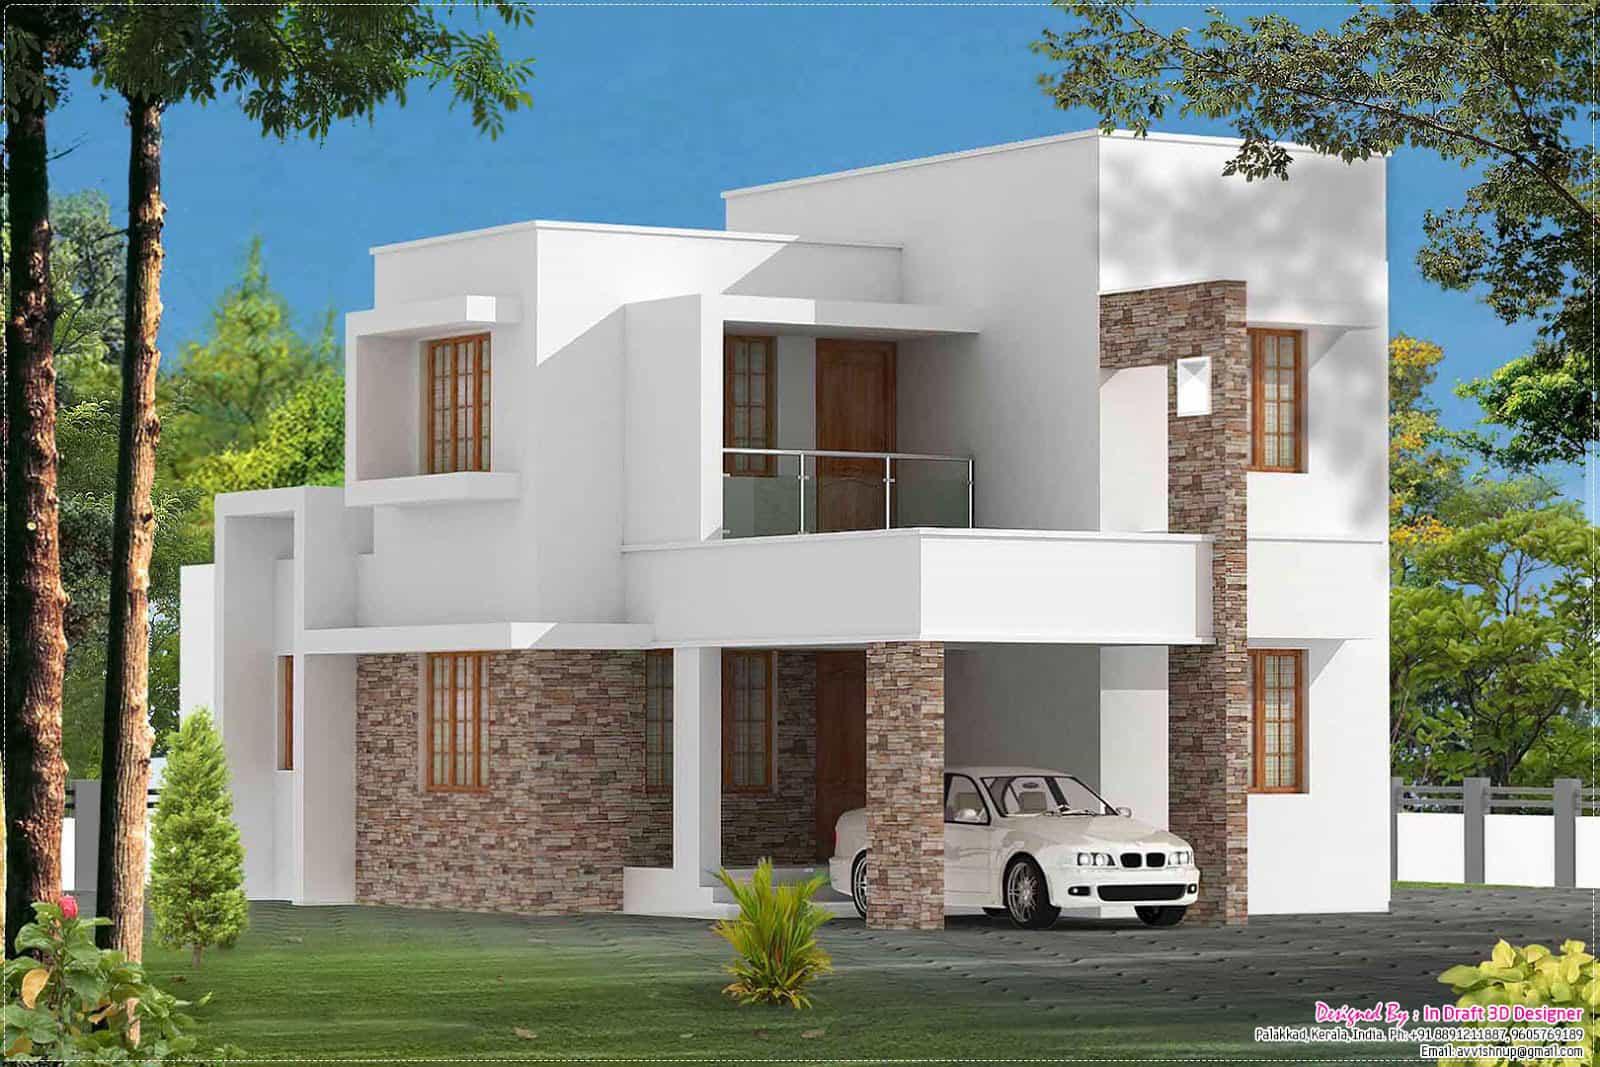 Kerala home design sqft kerala home low cost contemporary house - 3 Bedroom Contemporary Kerala Home At 1680 Sq Ft